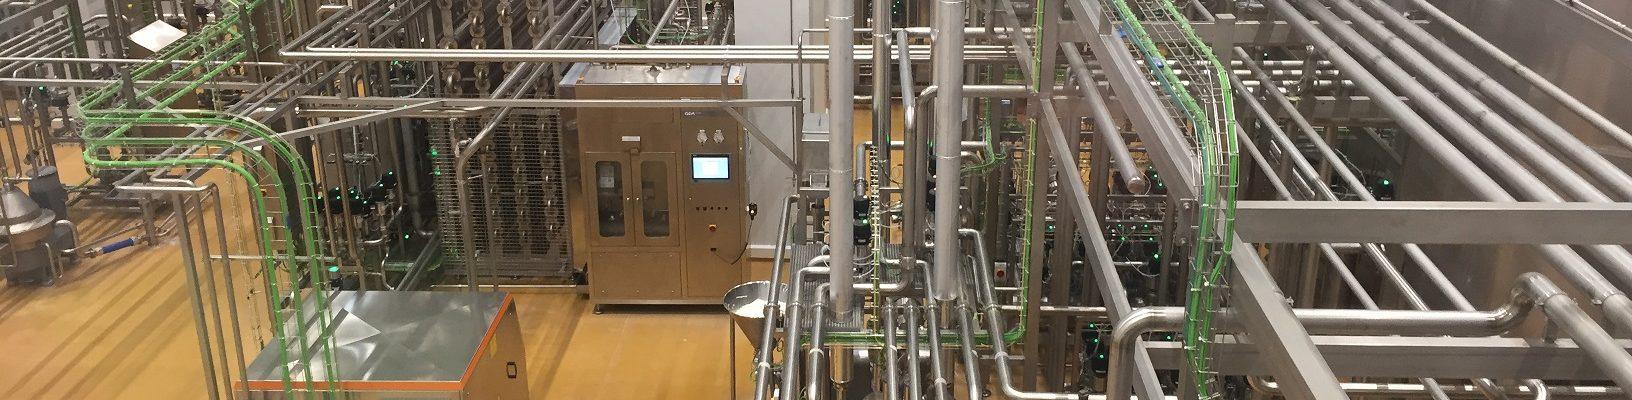 Lab2Factory